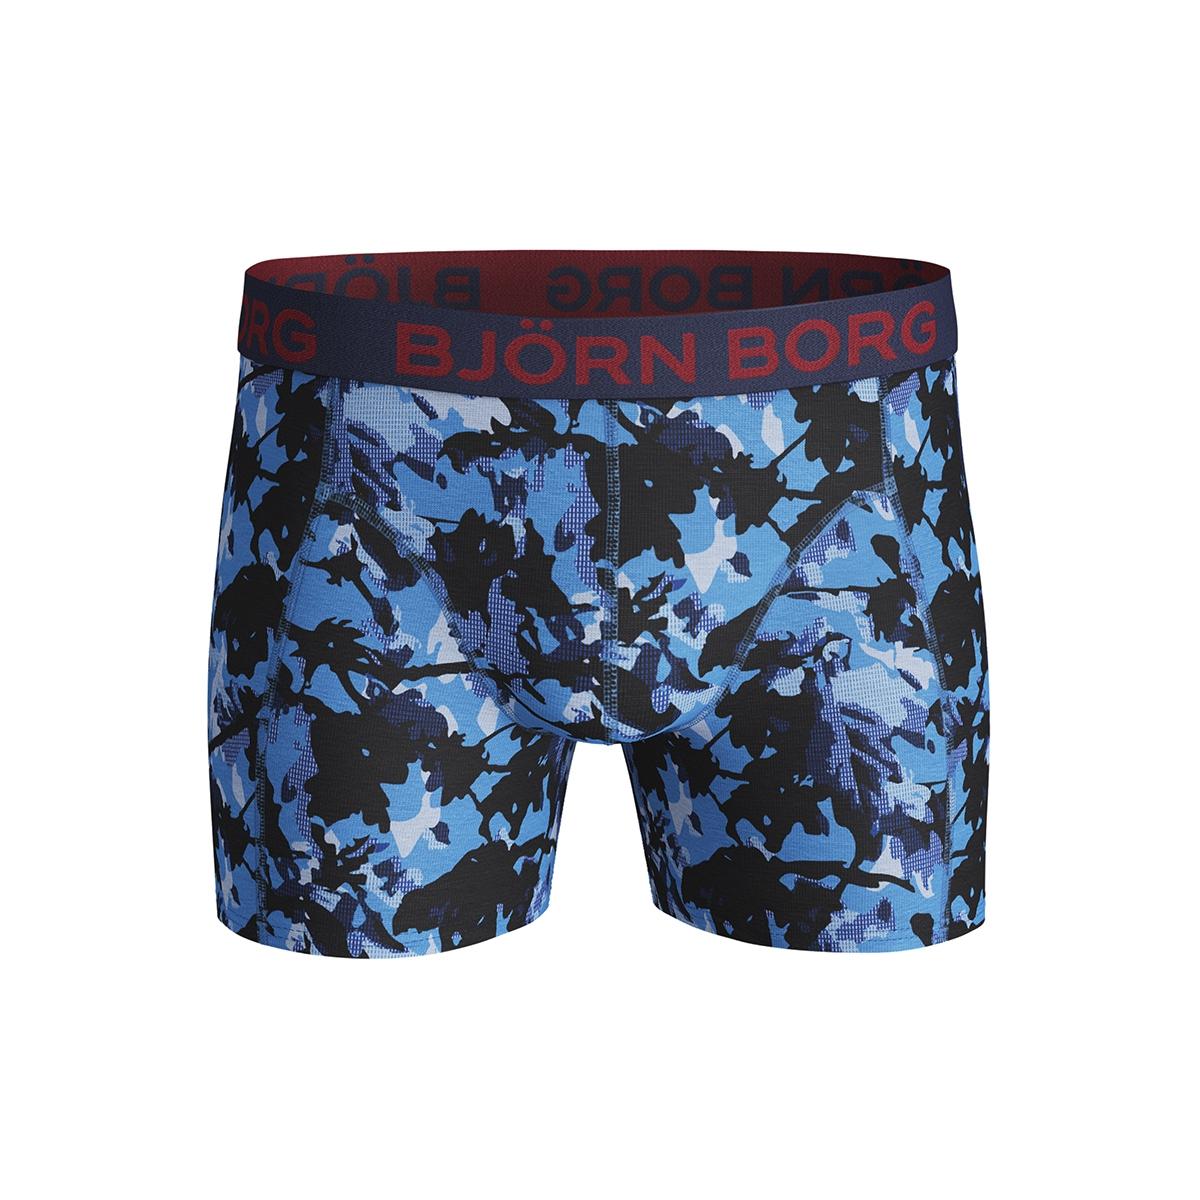 shorts bb branch 9999 1215 bjorn borg ondergoed 71171 bonnie blue